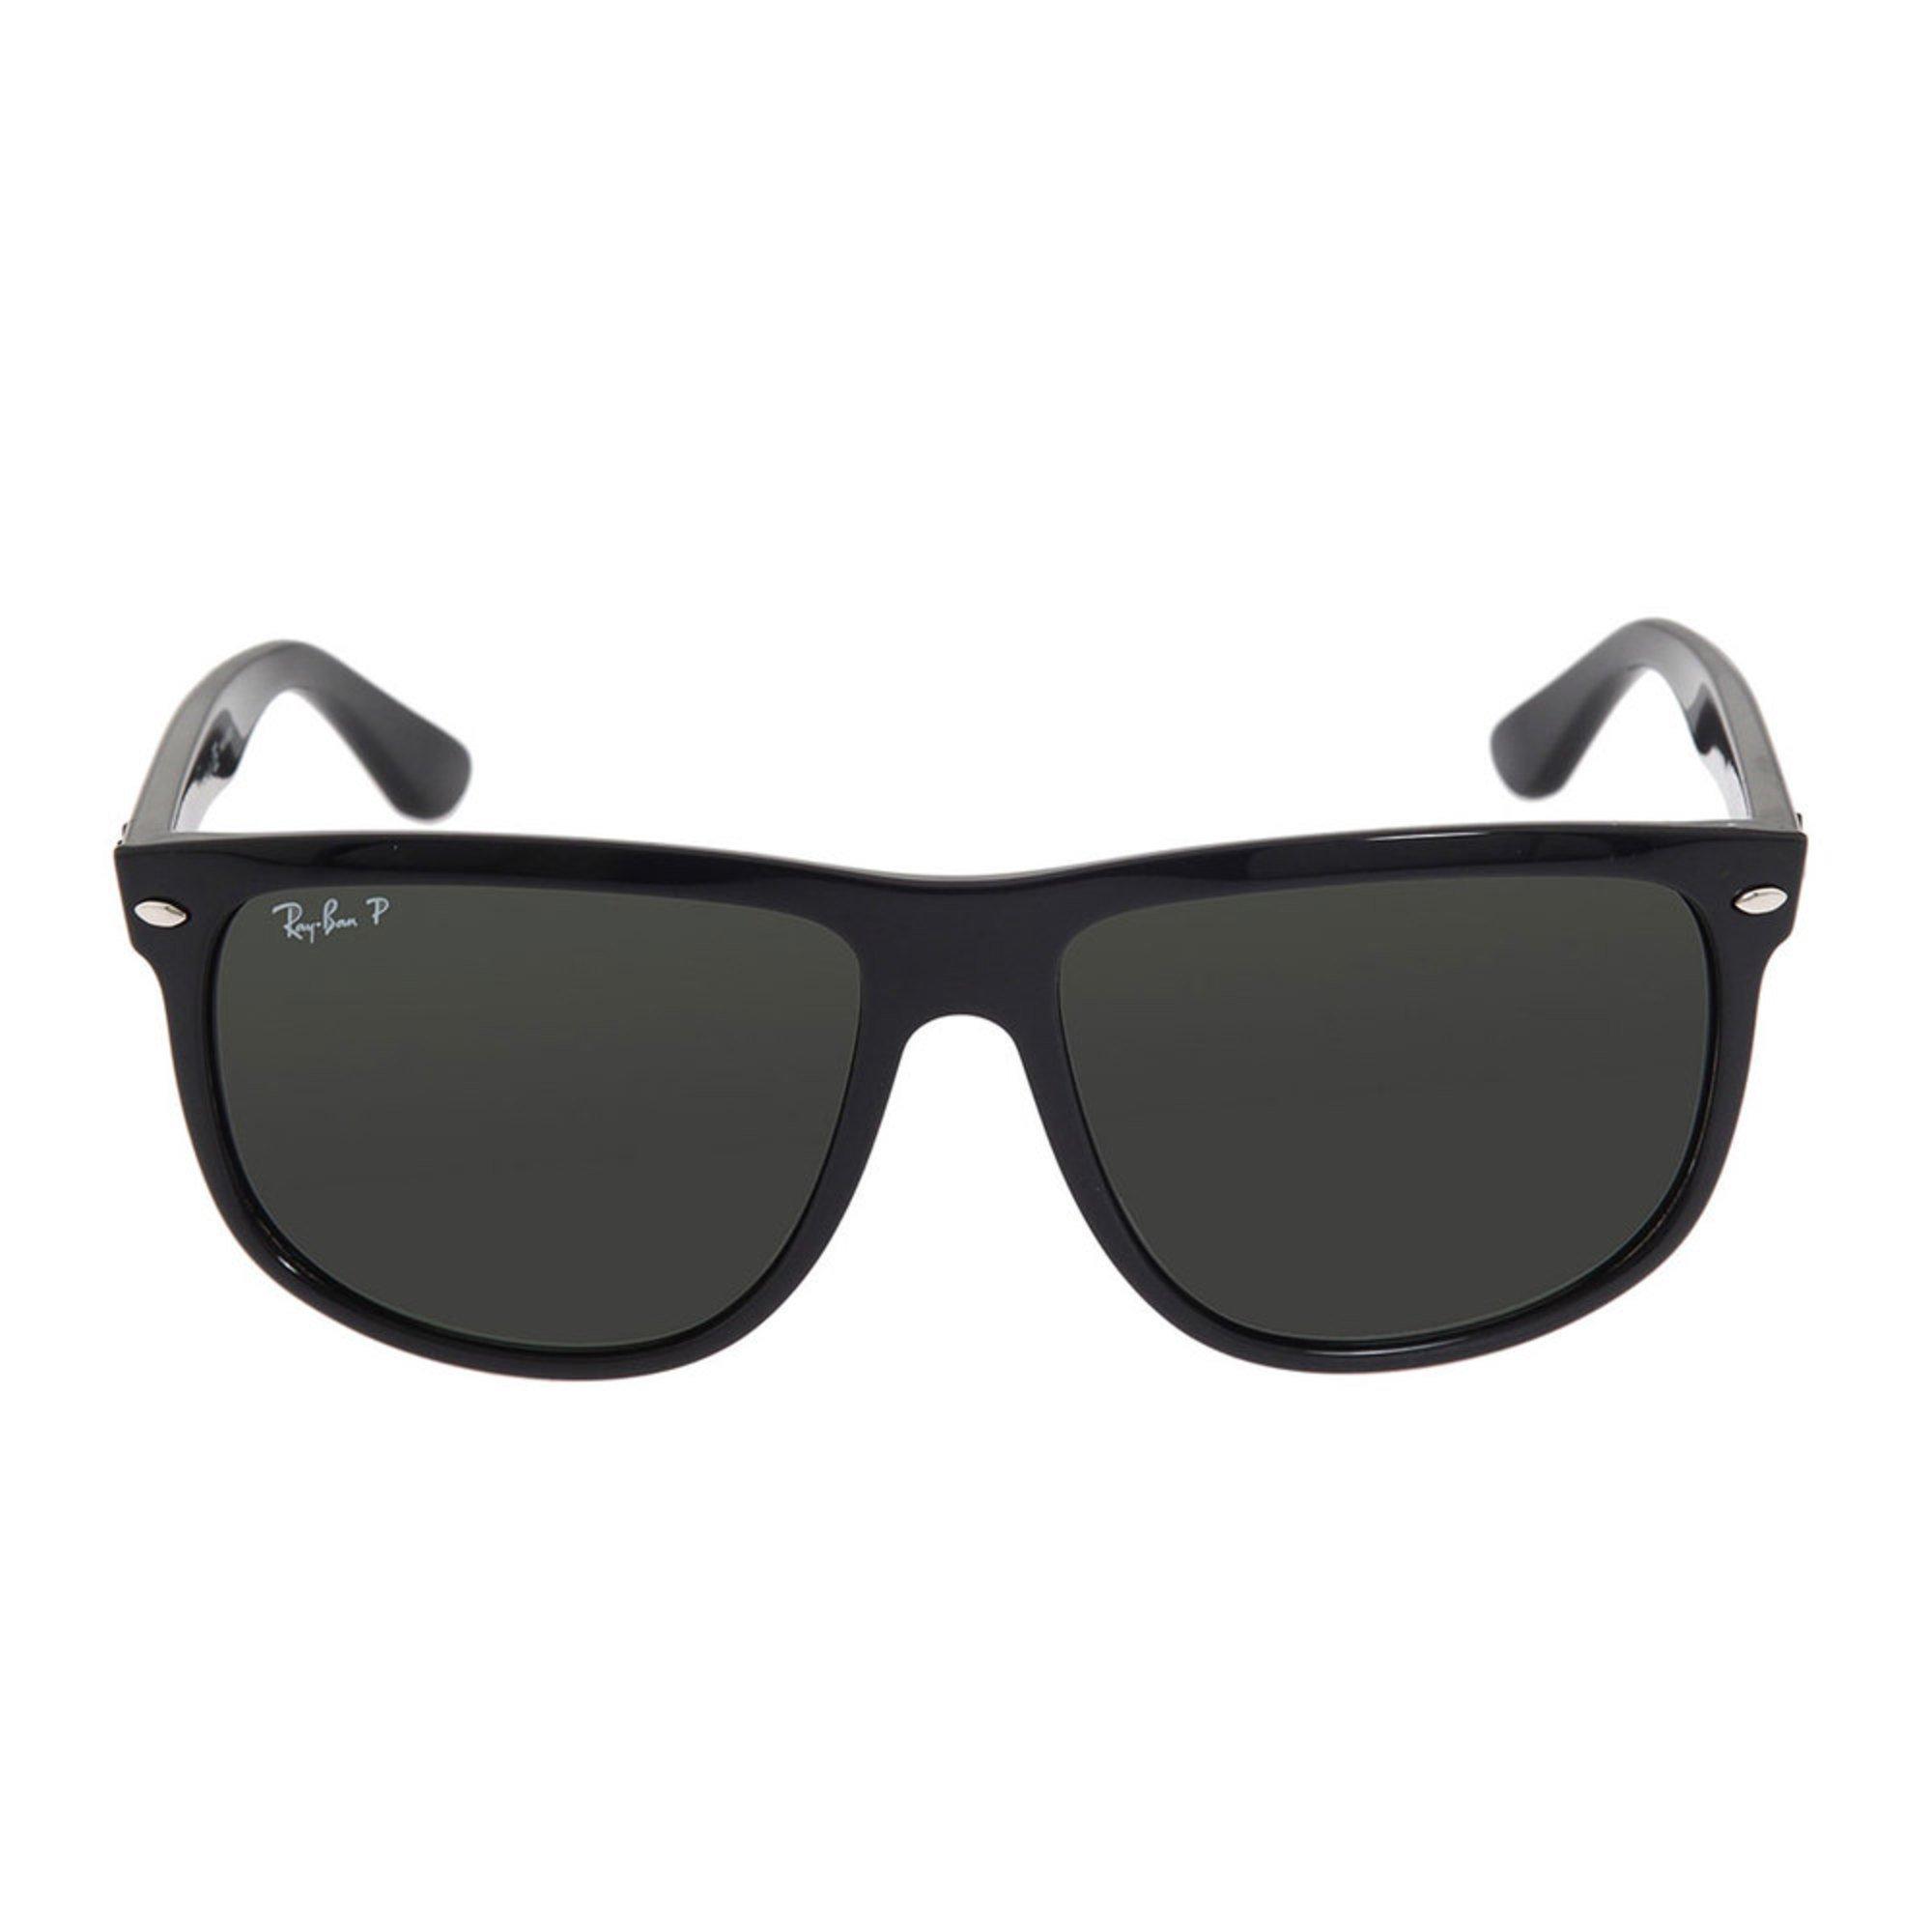 a553334c23 Polarized Ray Ban Sunglasses 14.99 « Heritage Malta